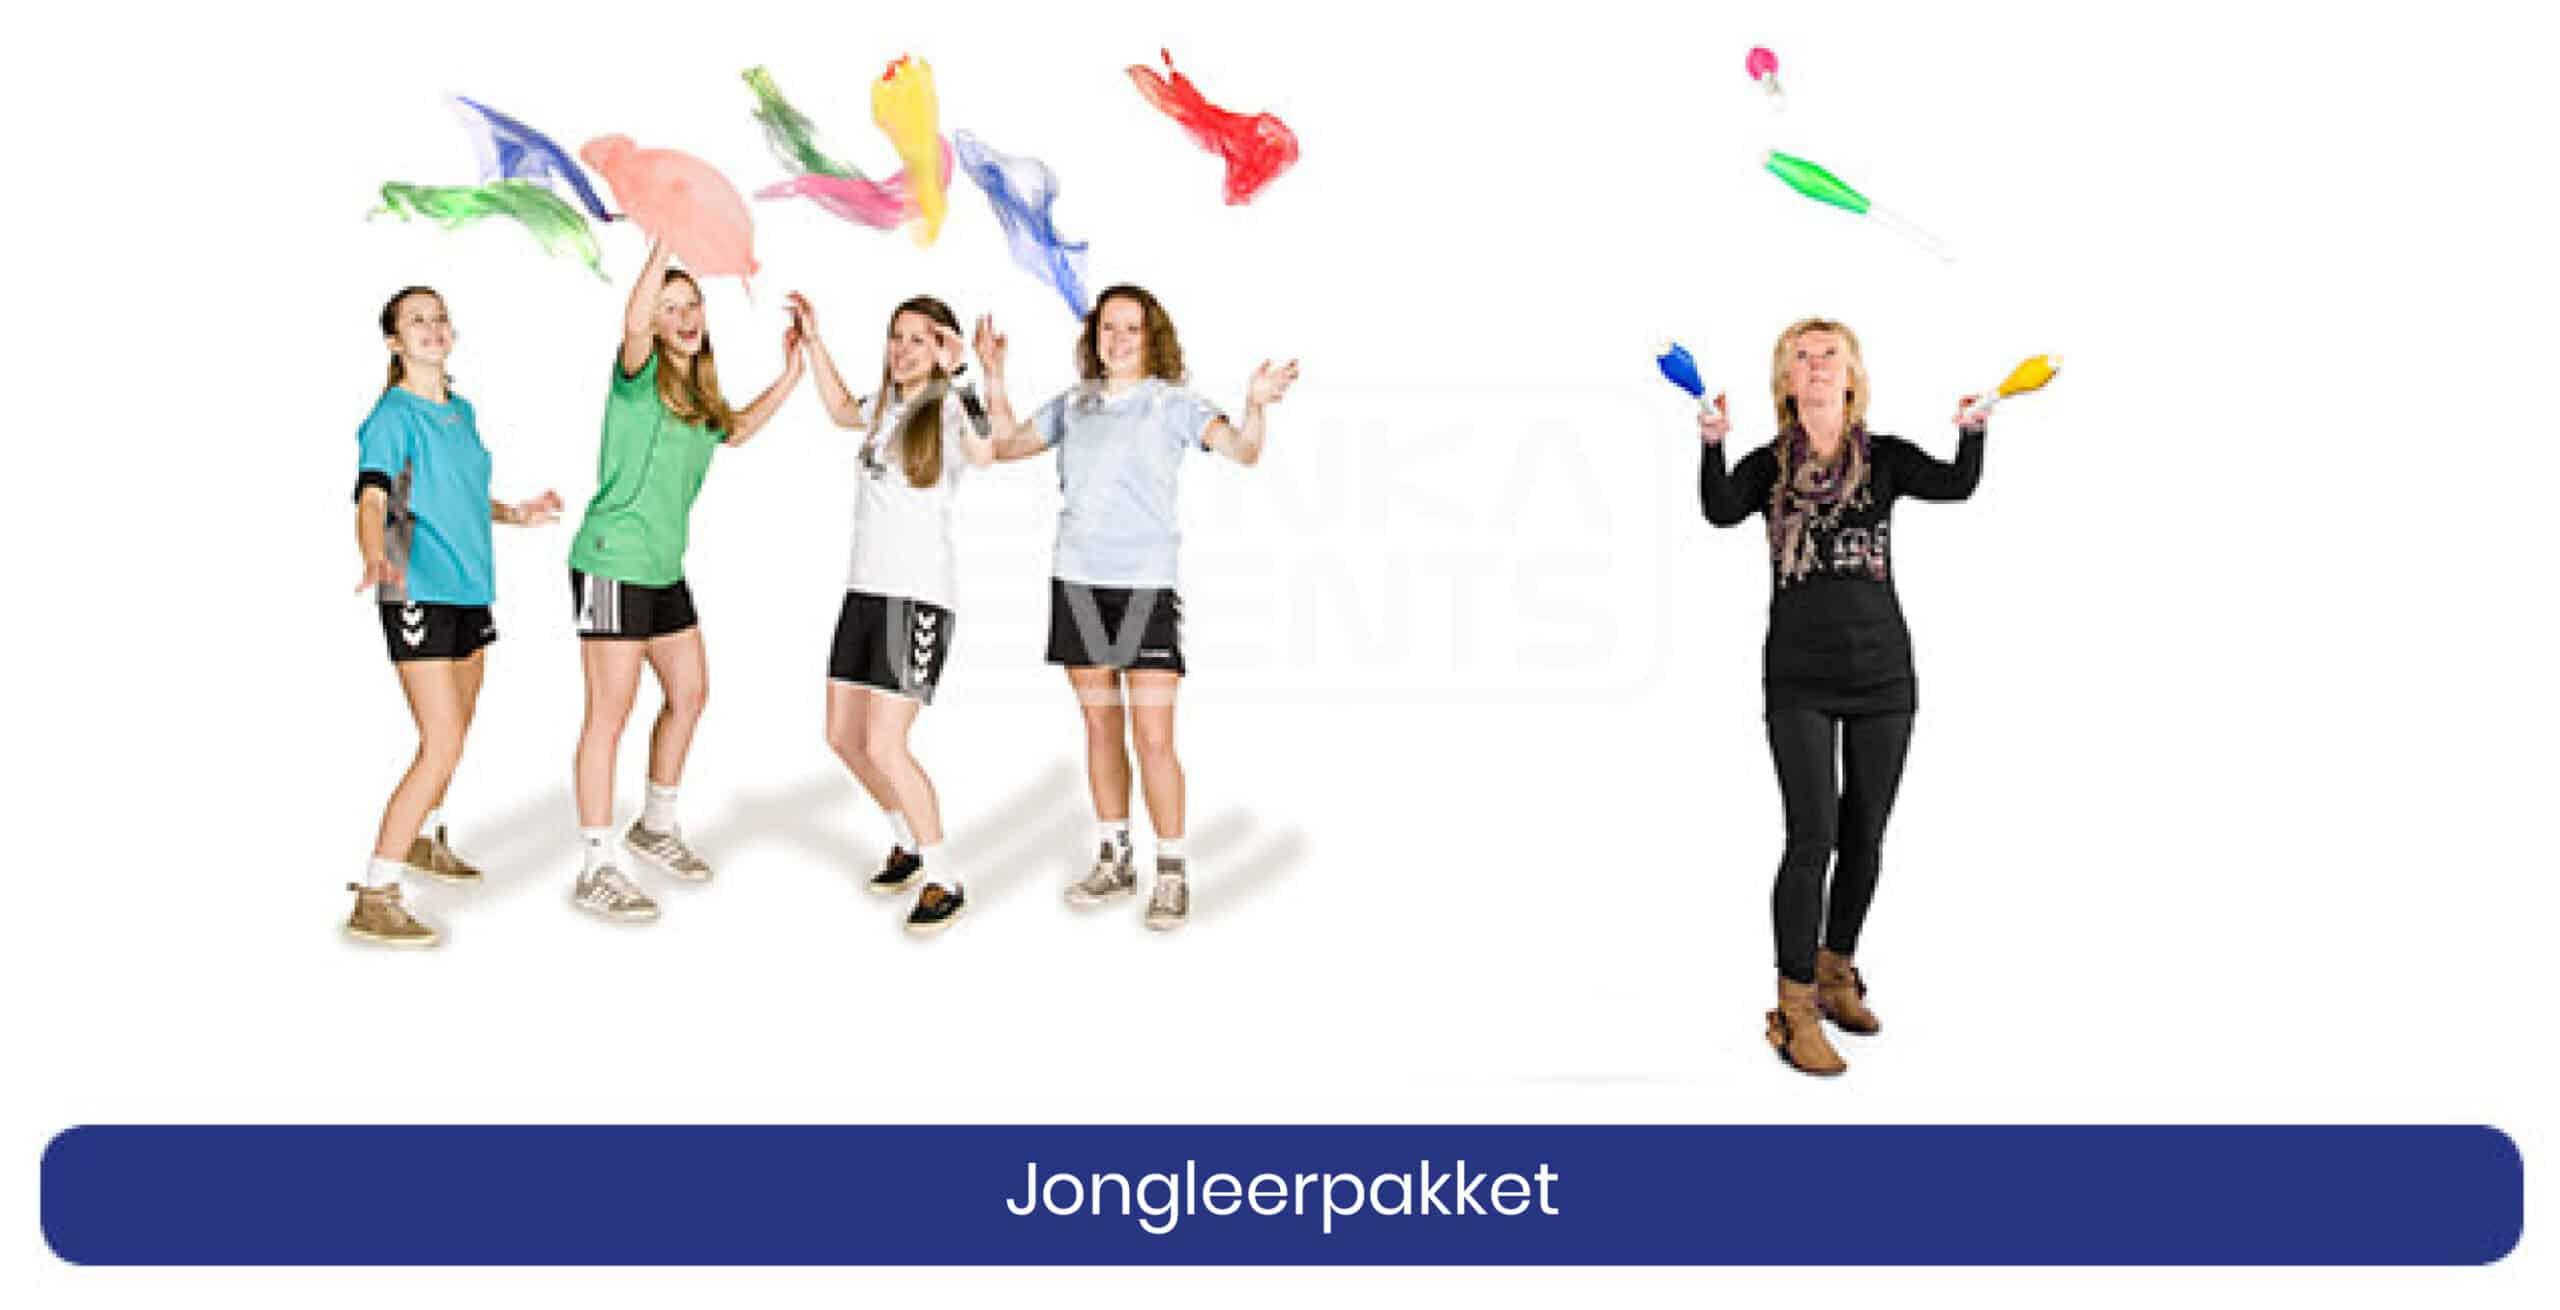 Coronaproof Spellenpakket Jongleerpakket